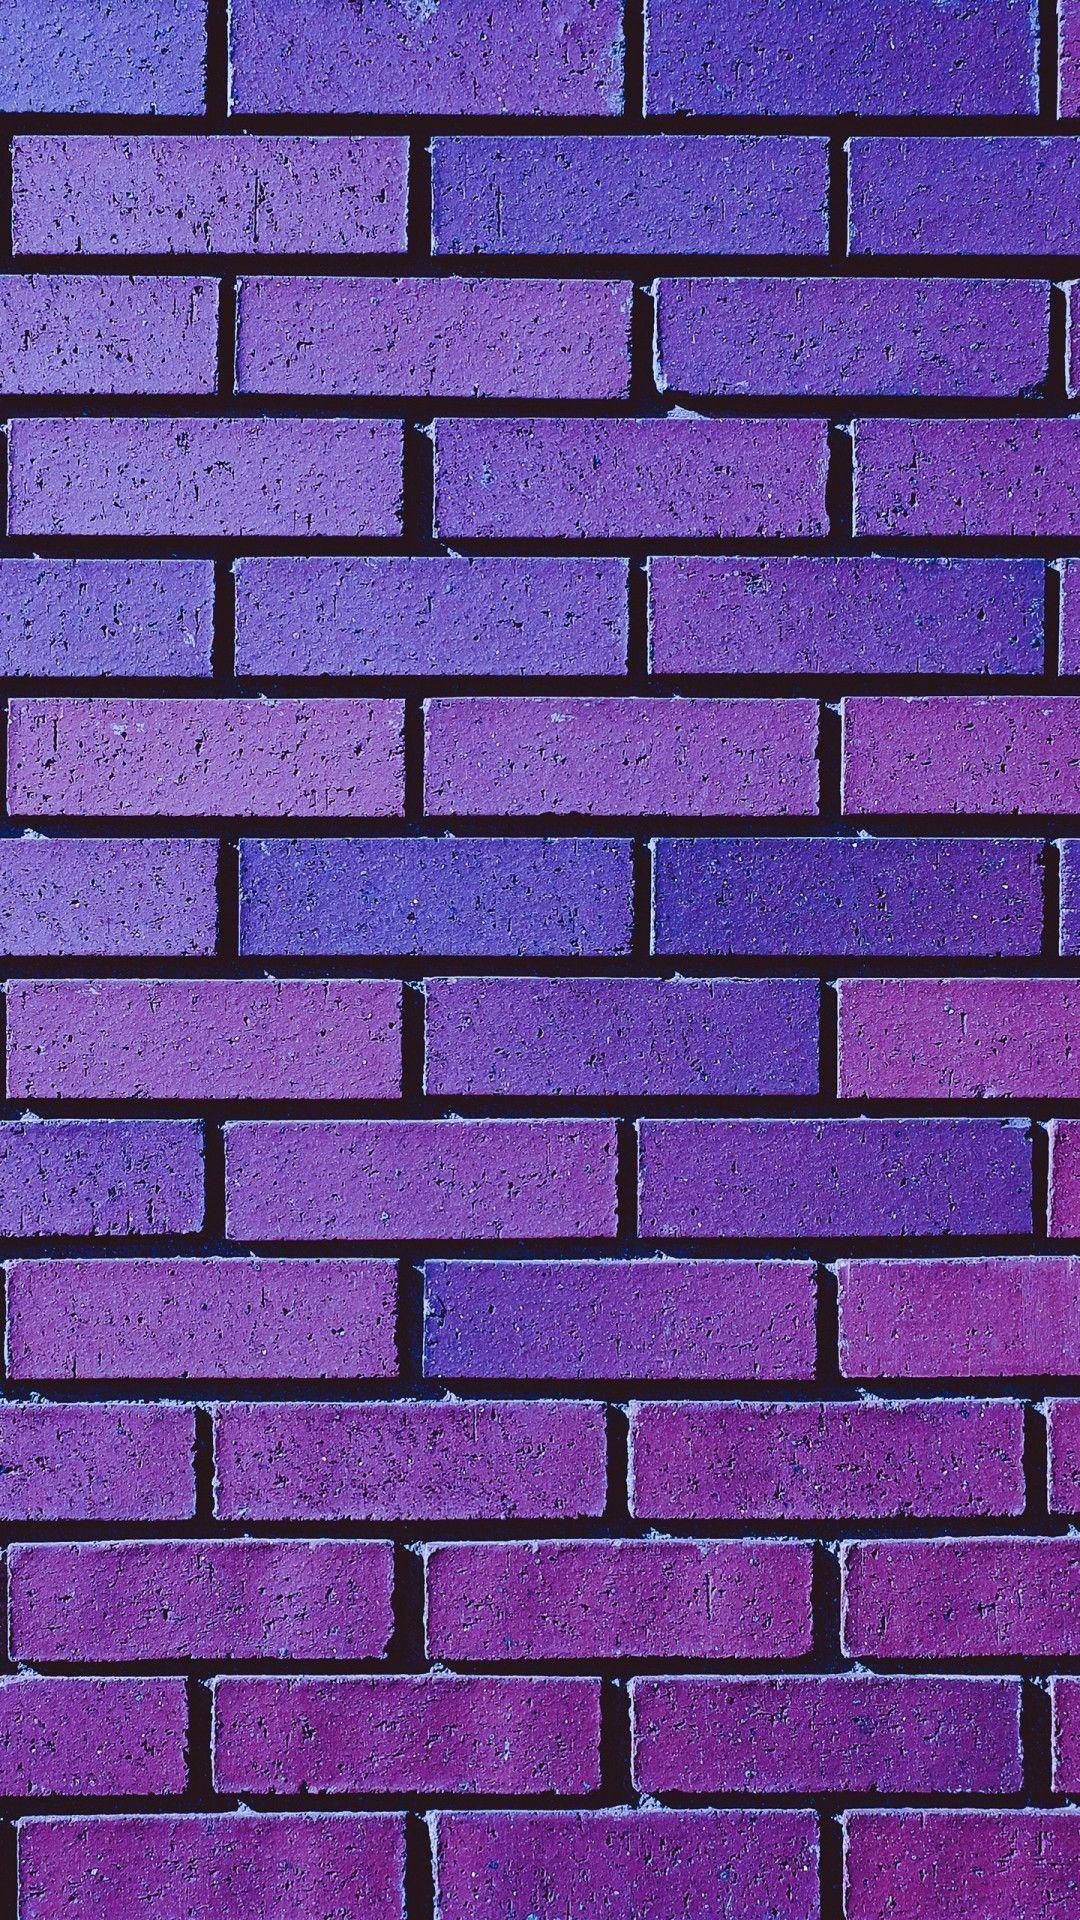 Purple Brick Wallpapers   Top Free Purple Brick Backgrounds ...